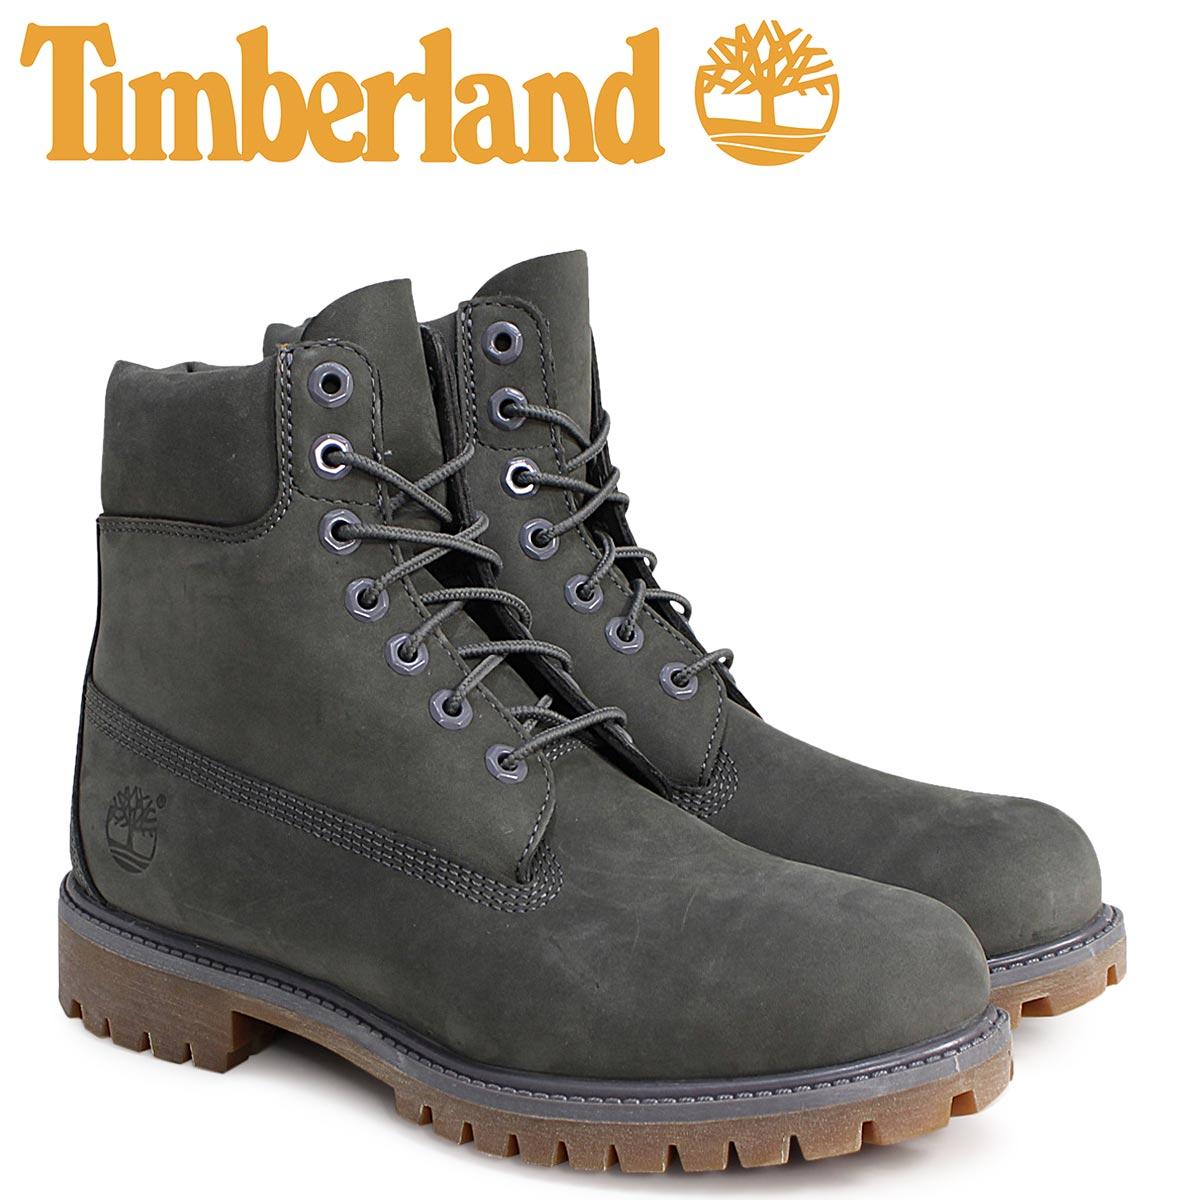 Timberland timberland 6 inches premium boots men 6INCHI 6-INCH PREMIUM  WATERPLOOF BOOTS A114K gray waterproofing  12 16 Shinnyu load  863b814928fd